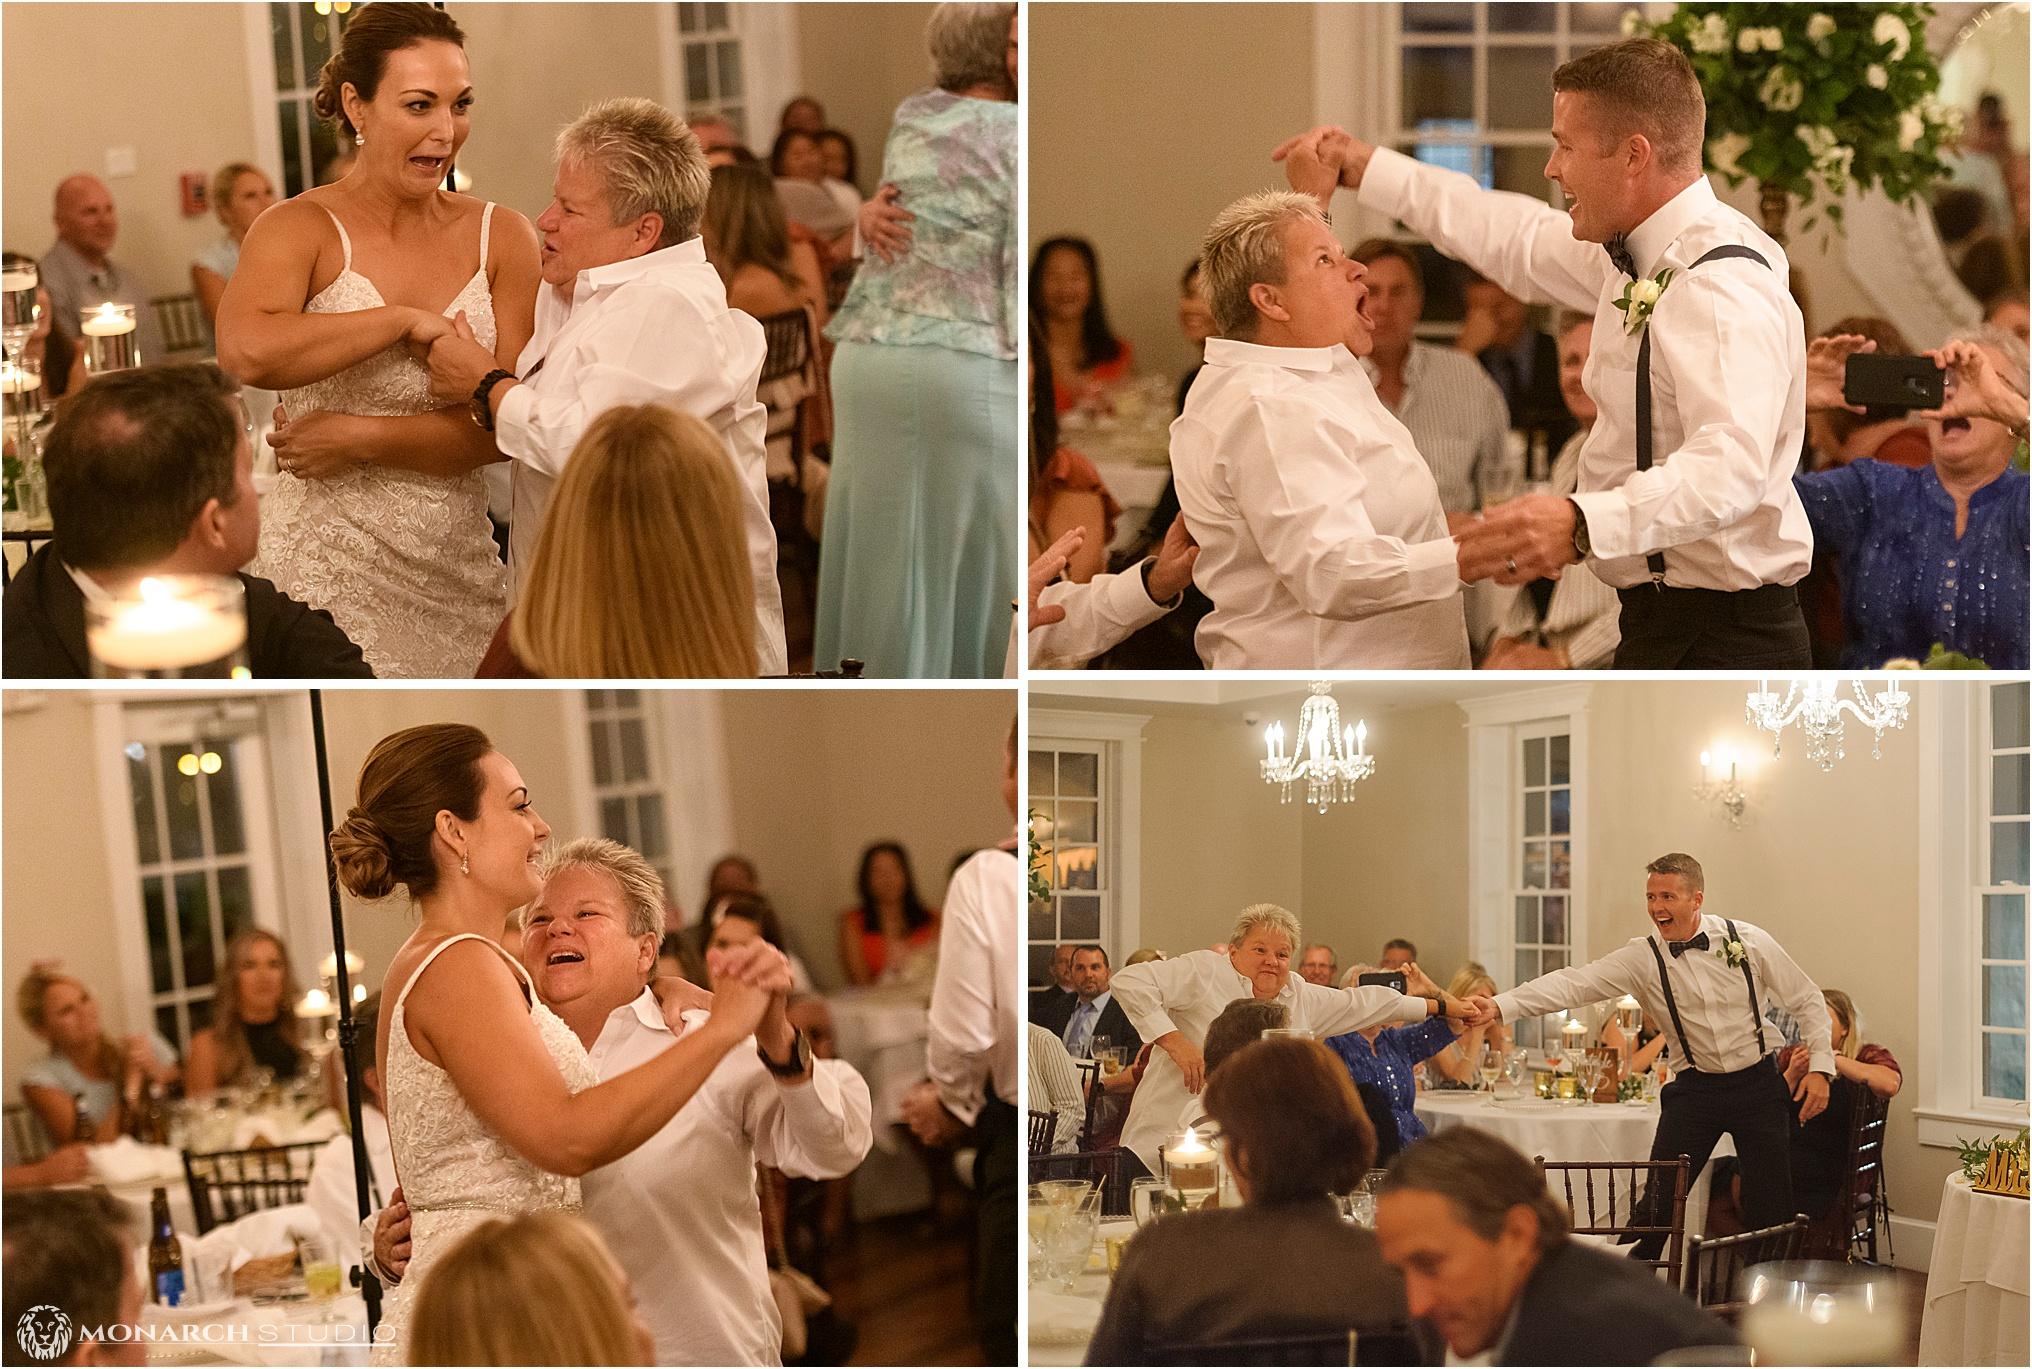 101-whiteroom-wedding-photographer-2019-05-22_0083.jpg